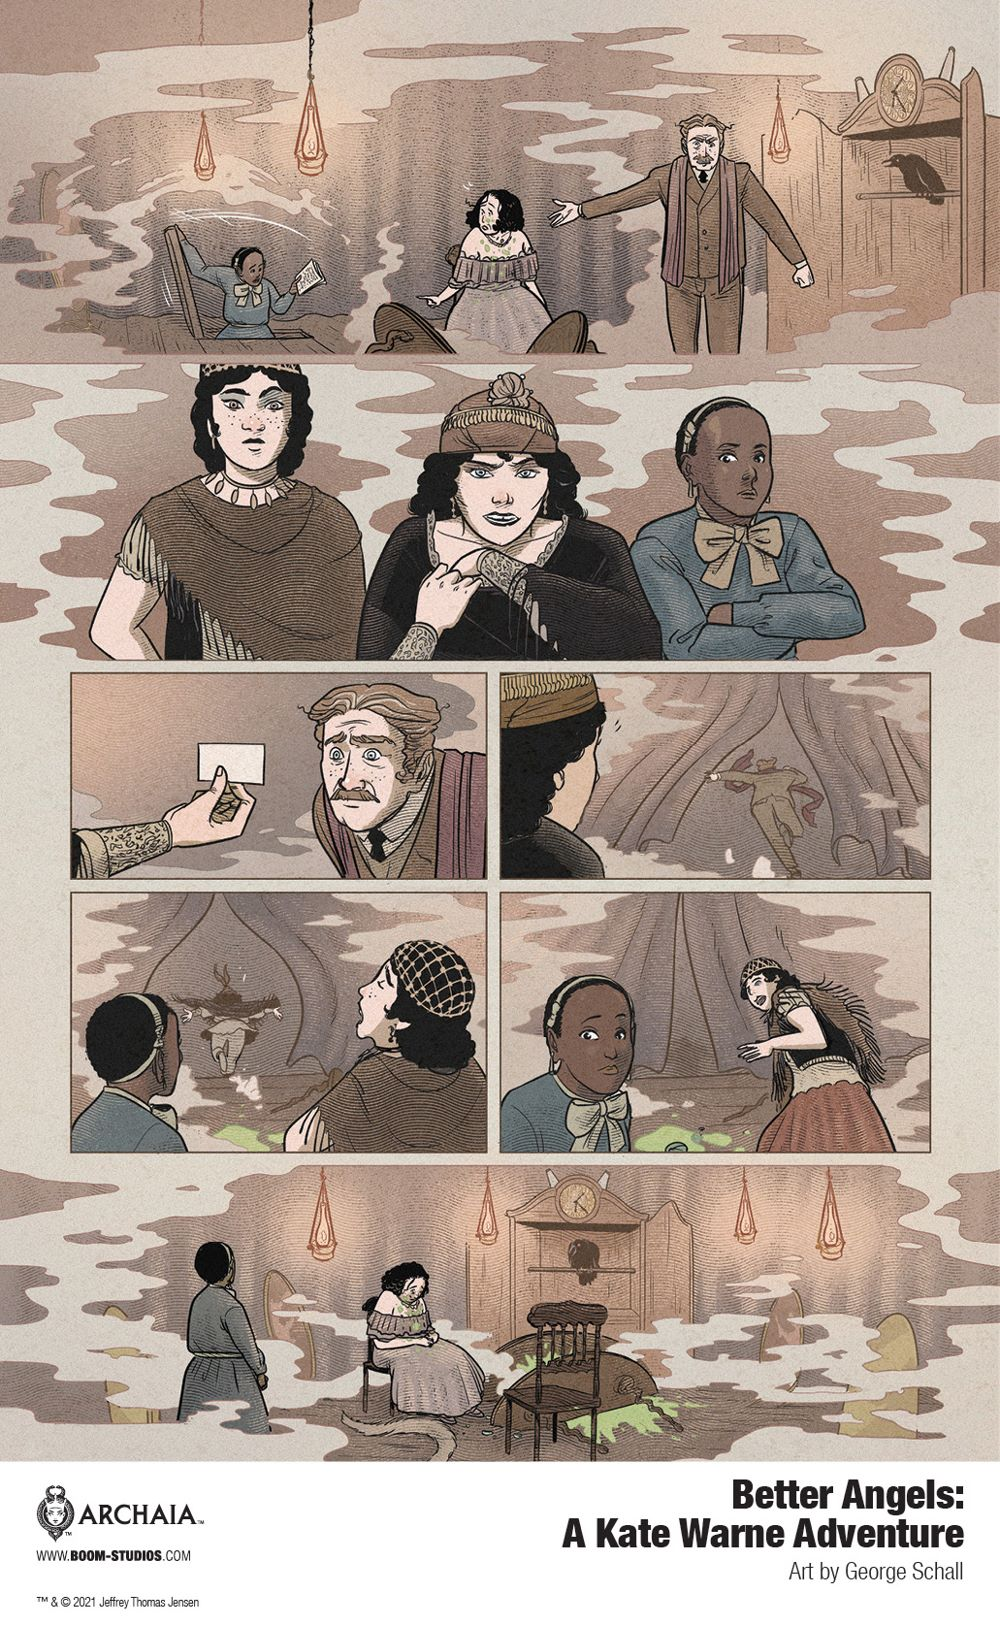 BetterAngels_HC_InteriorArt_001_PROMO-1 America's first female detective discovers BETTER ANGELS